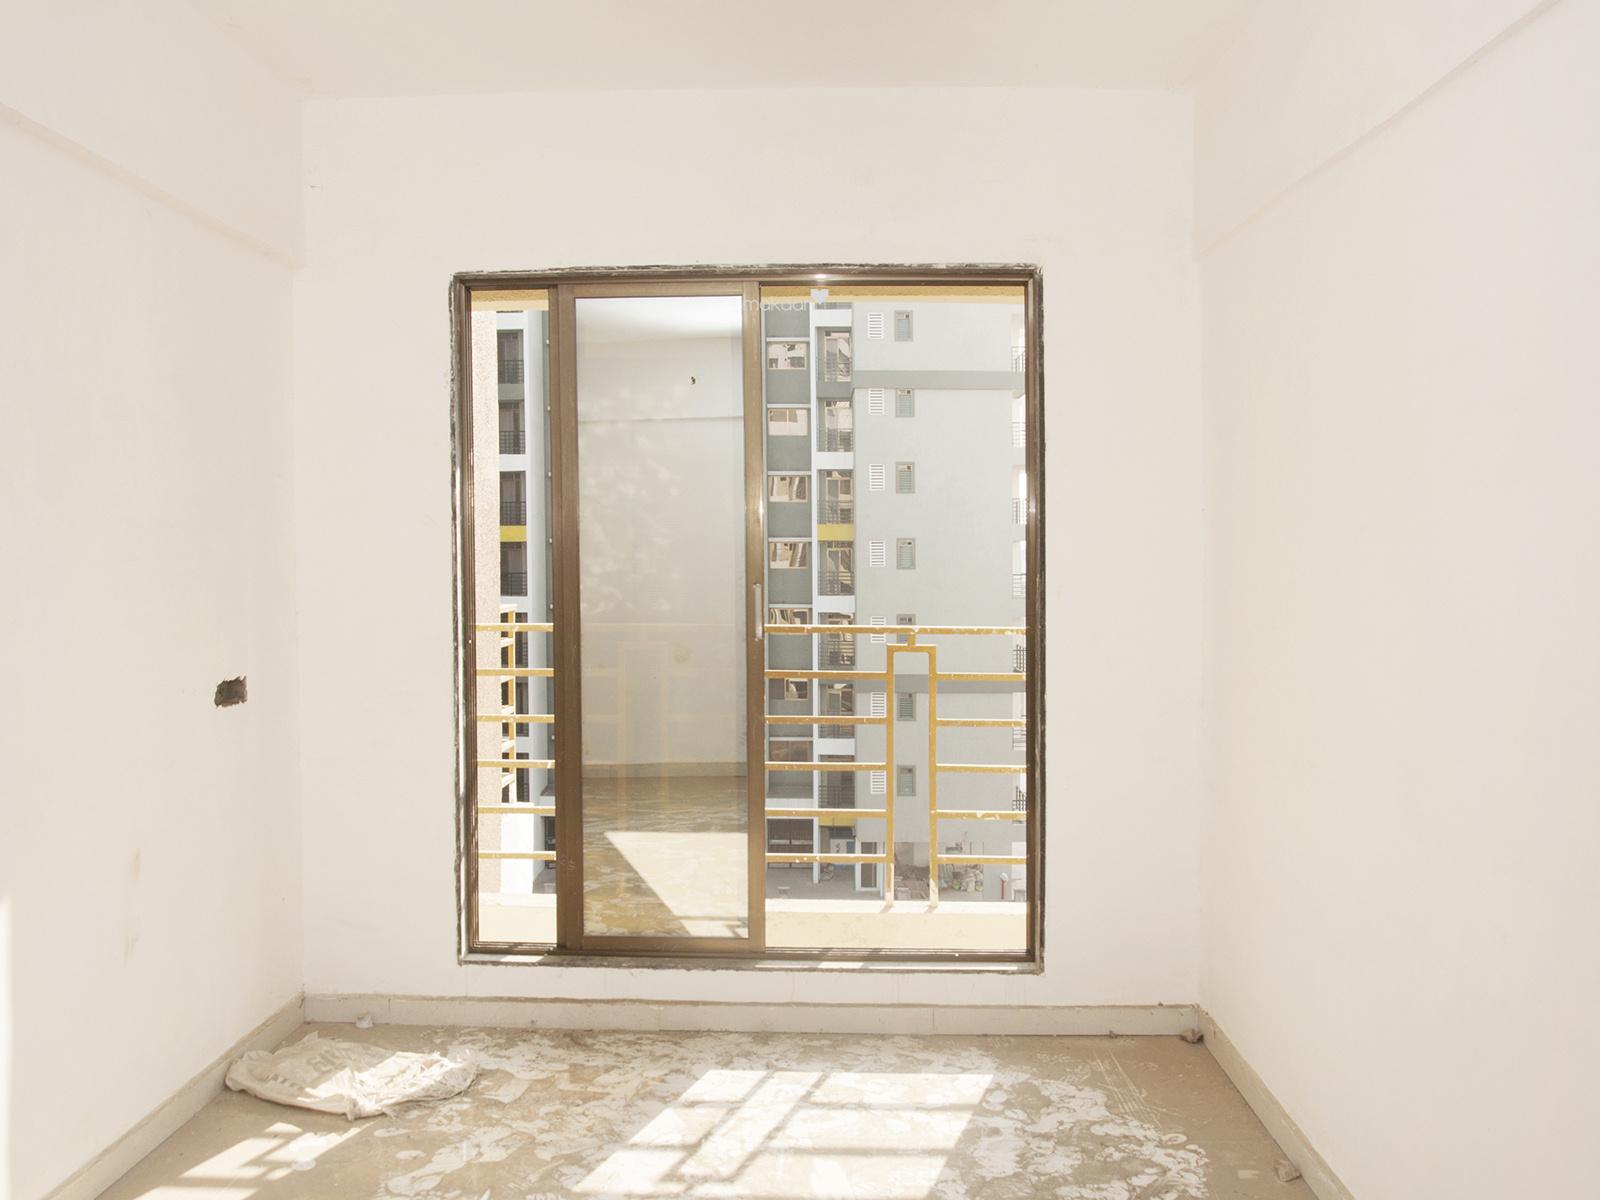 1030 sq ft 2BHK 2BHK+2T (1,030 sq ft) Property By Proptiger In Vruksh, Ulwe